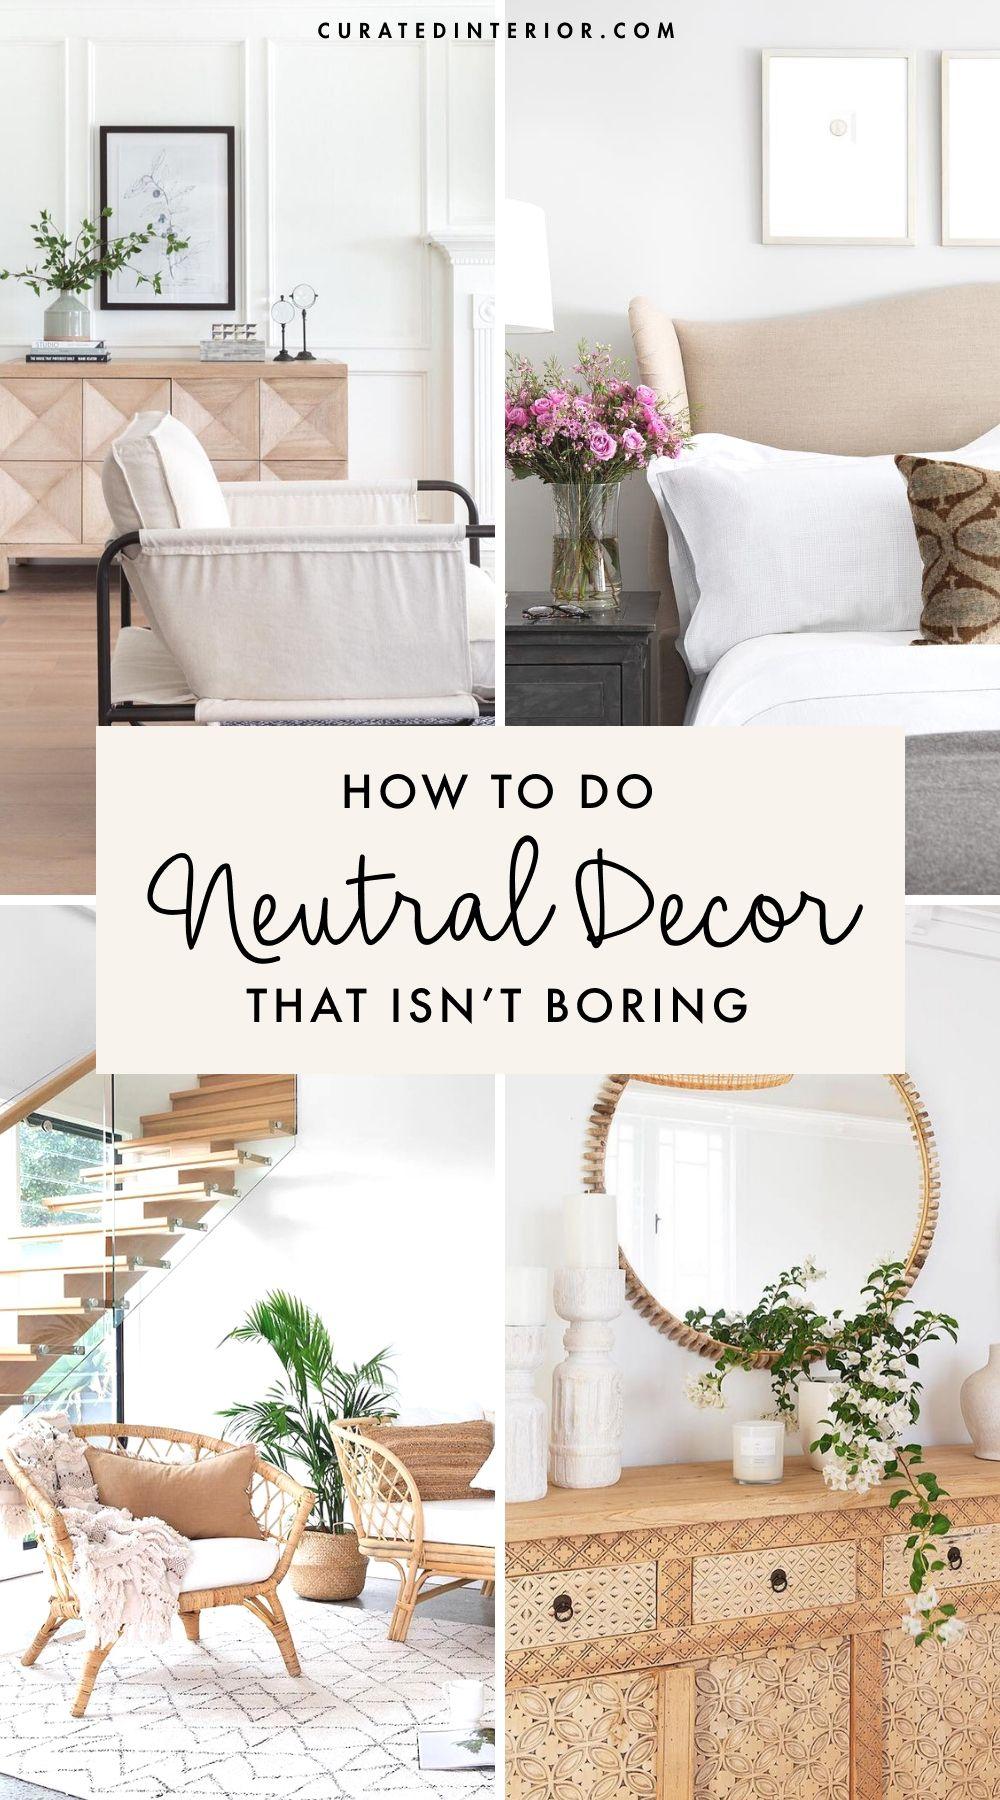 Neutral Decor that isn't boring